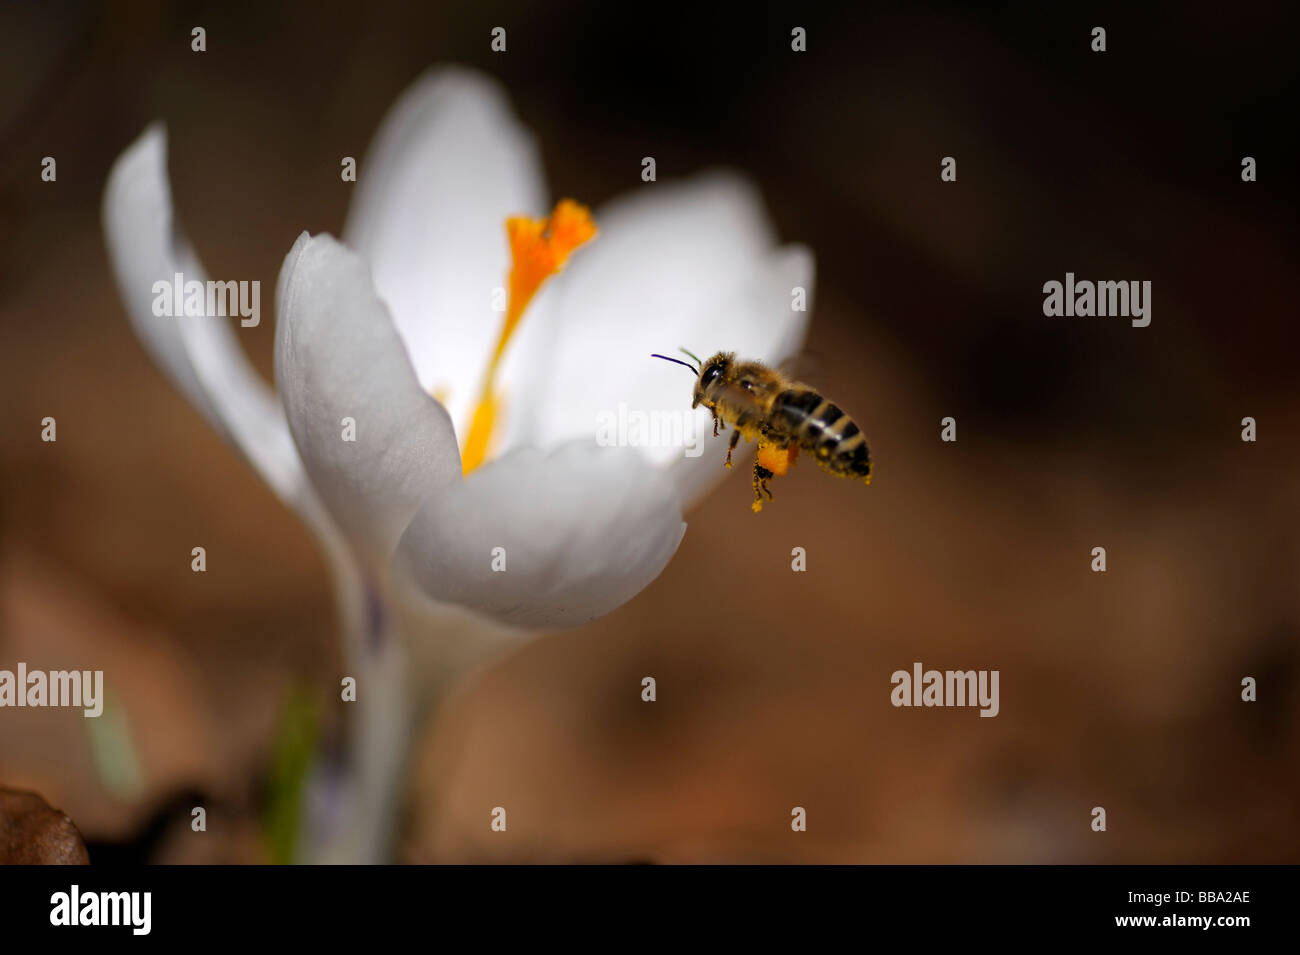 White crocus (Crocus) with settling honey bee (Apis mellifera) - Stock Image